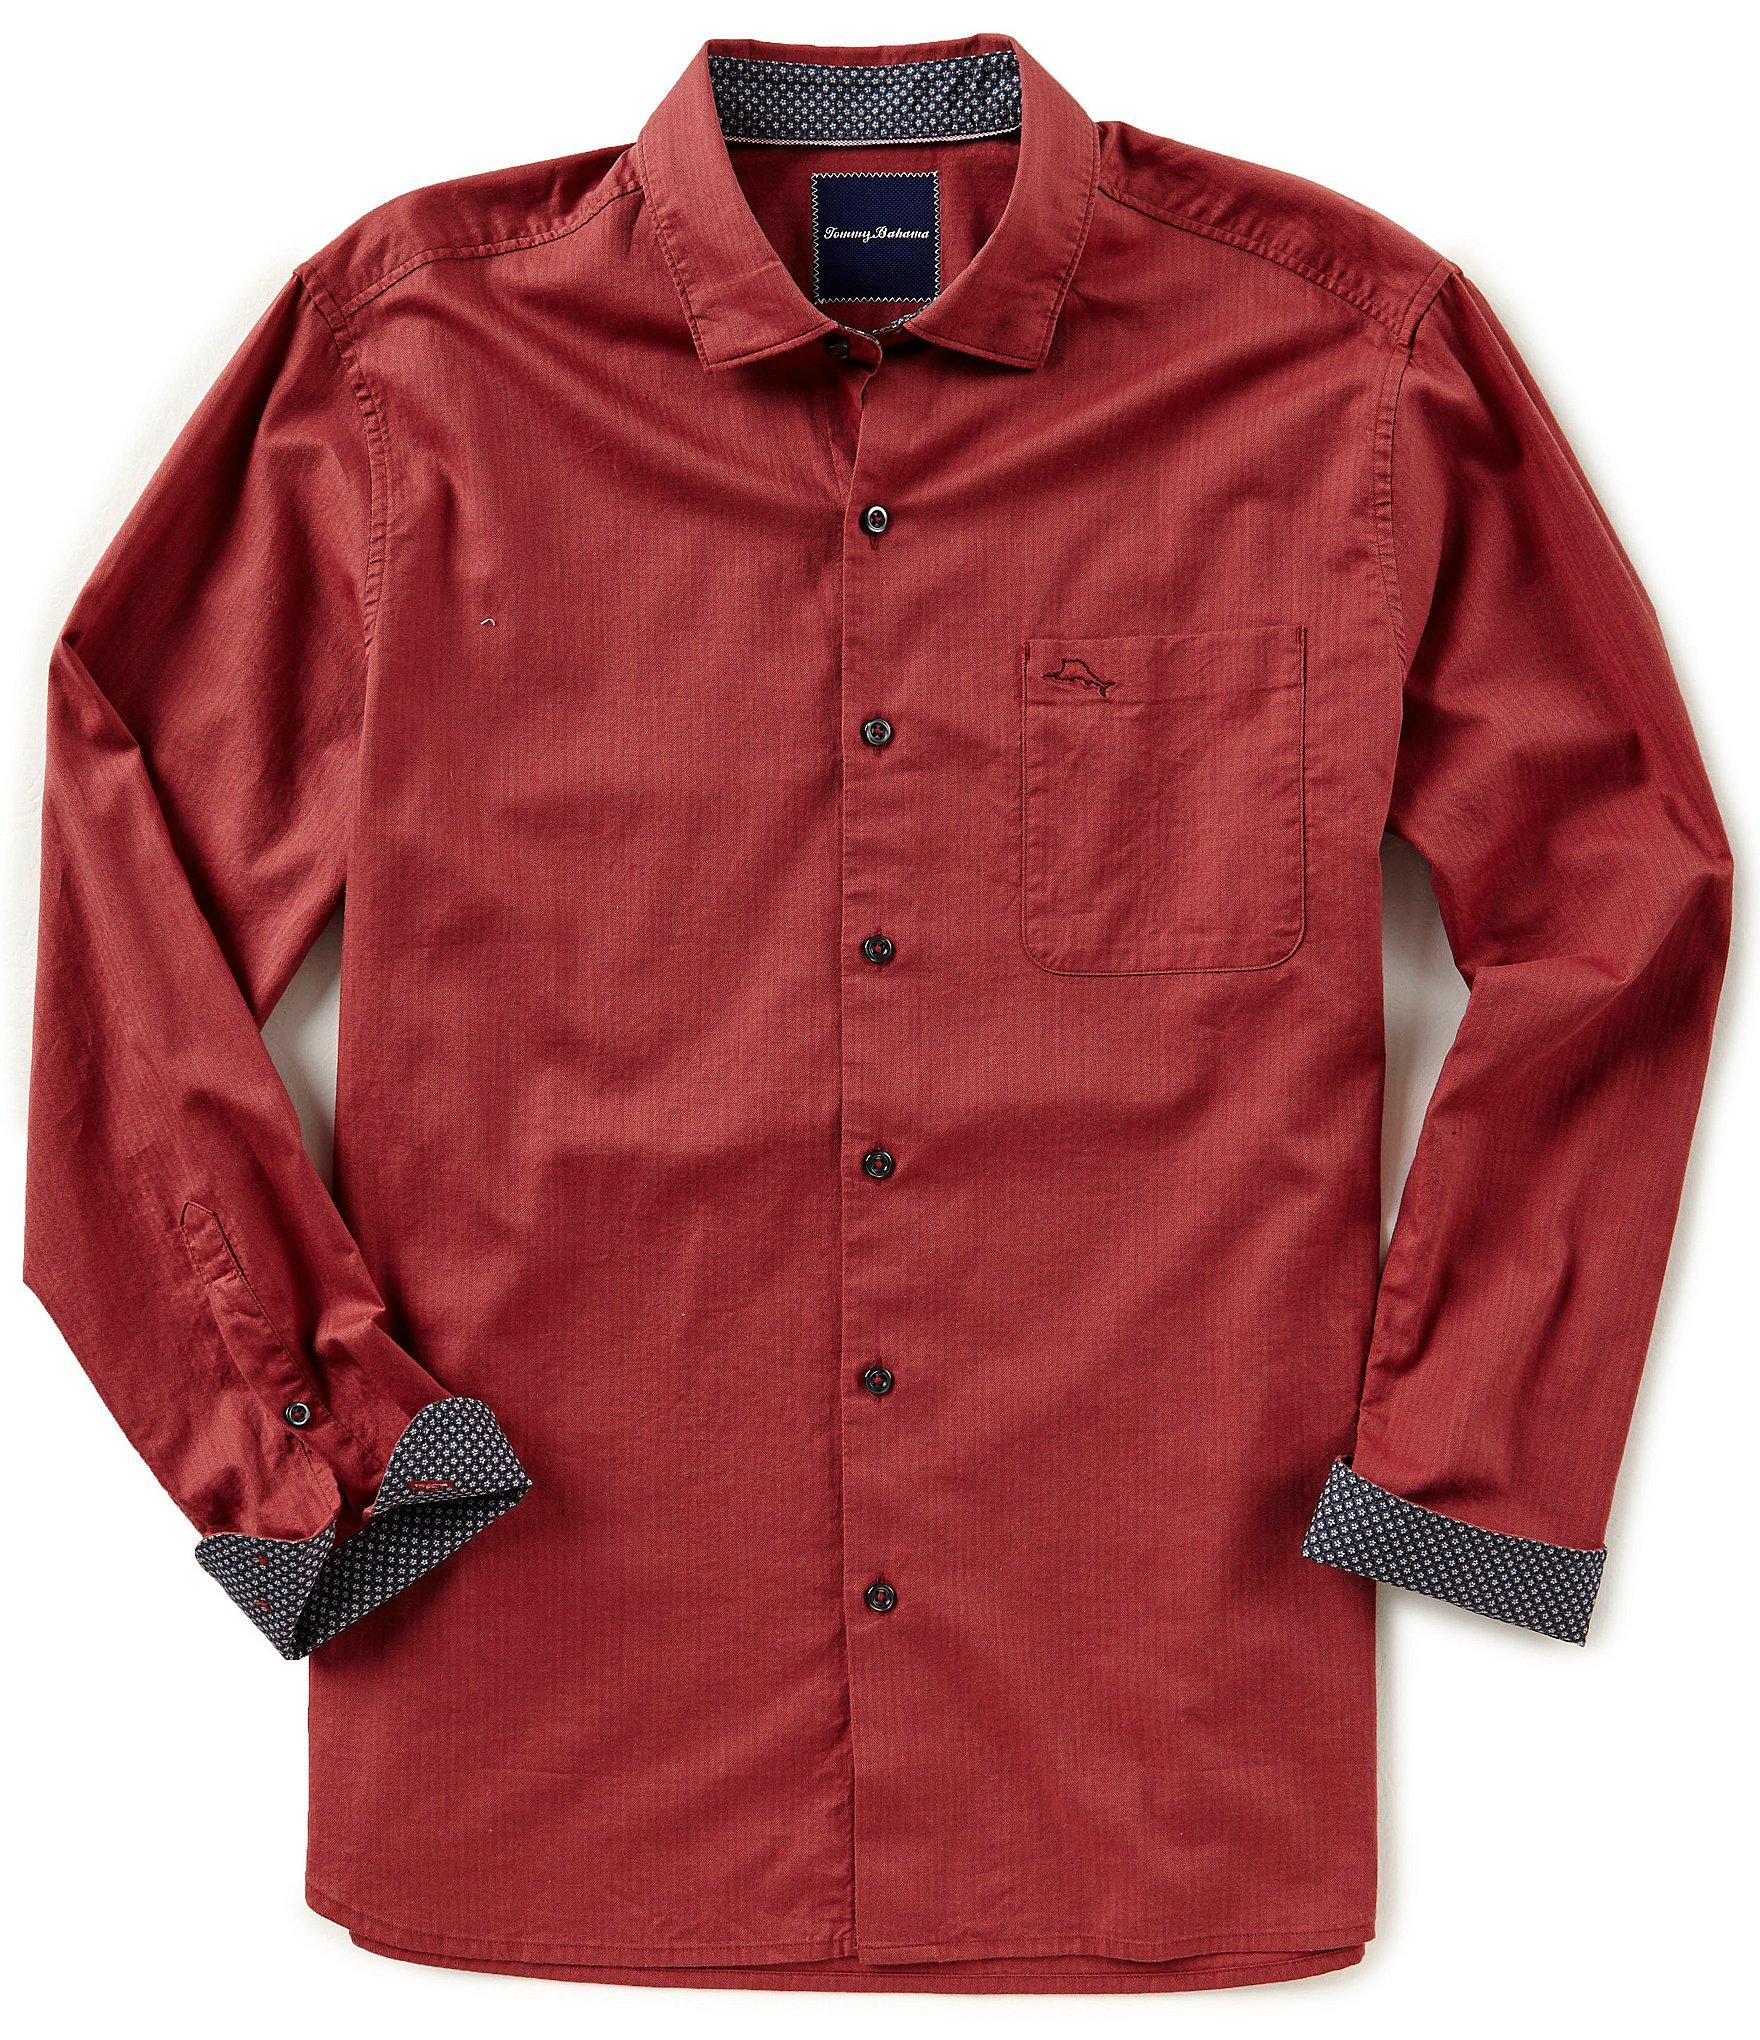 Men's Casual Button-Front Shirts | Dillards